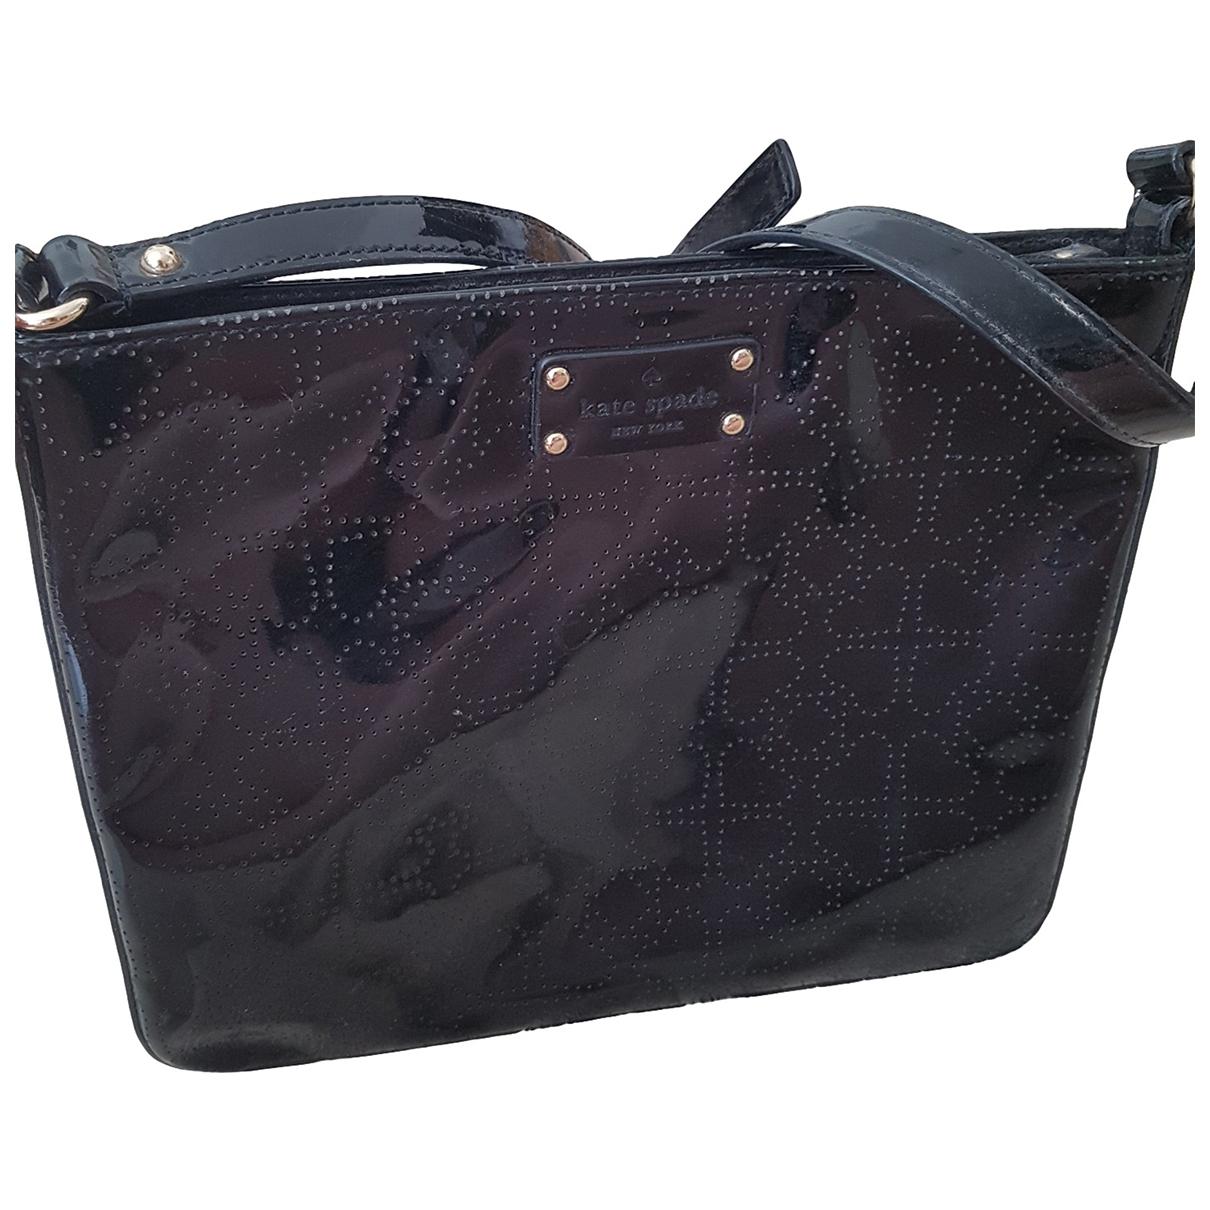 Kate Spade \N Black handbag for Women \N